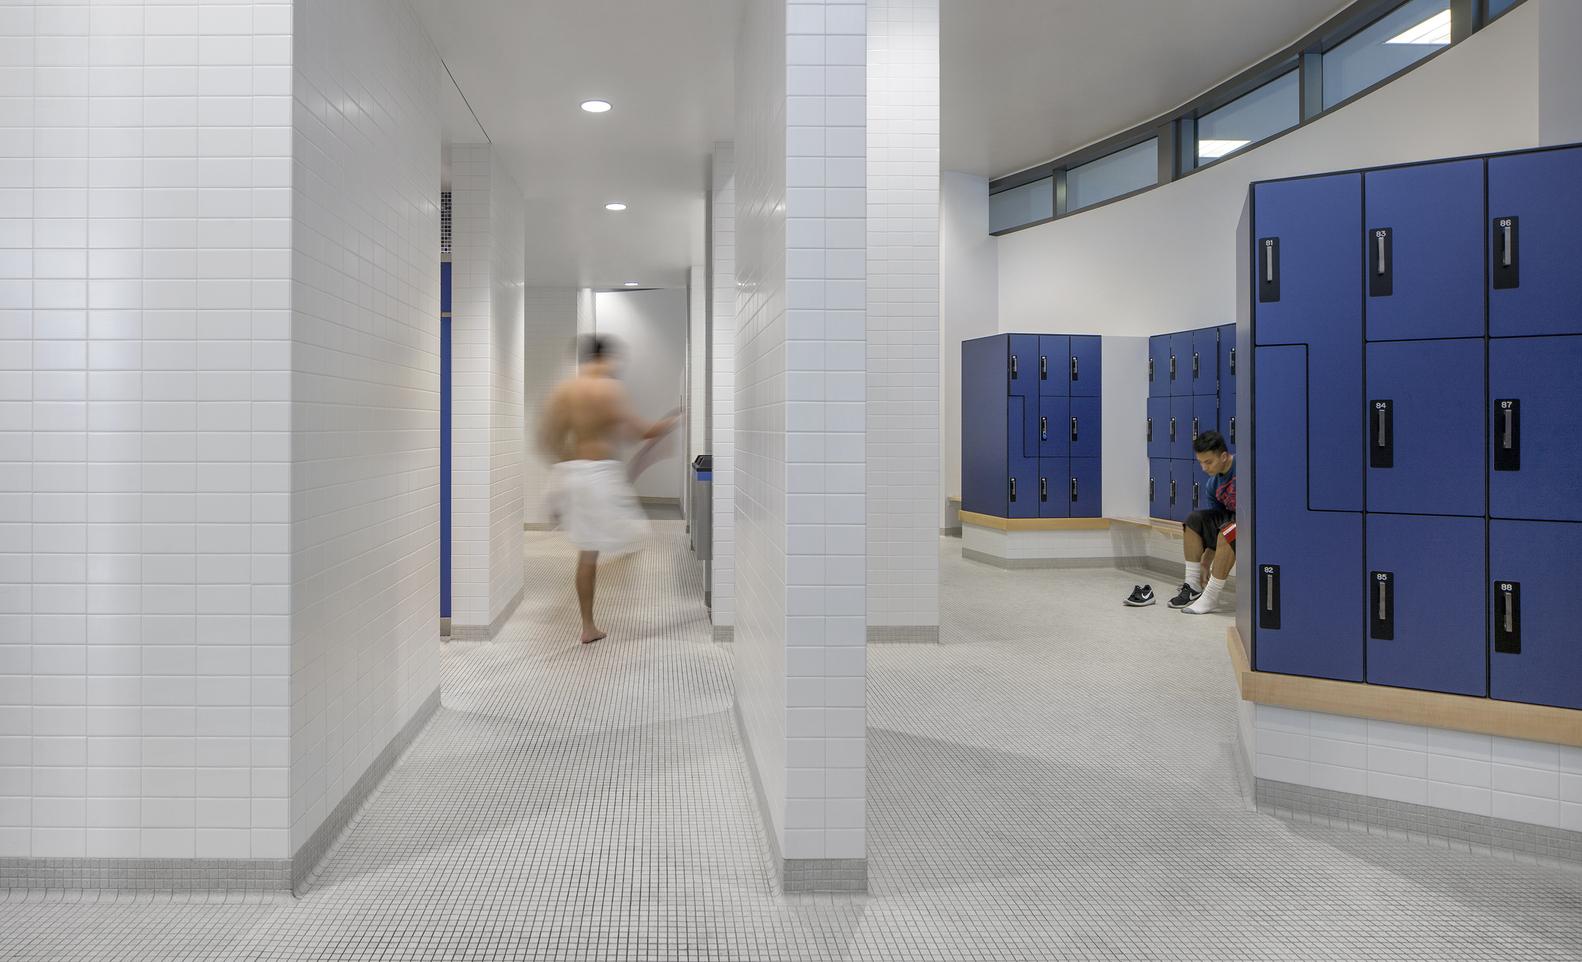 Дизайн спортивного комплекса – Раздевалка